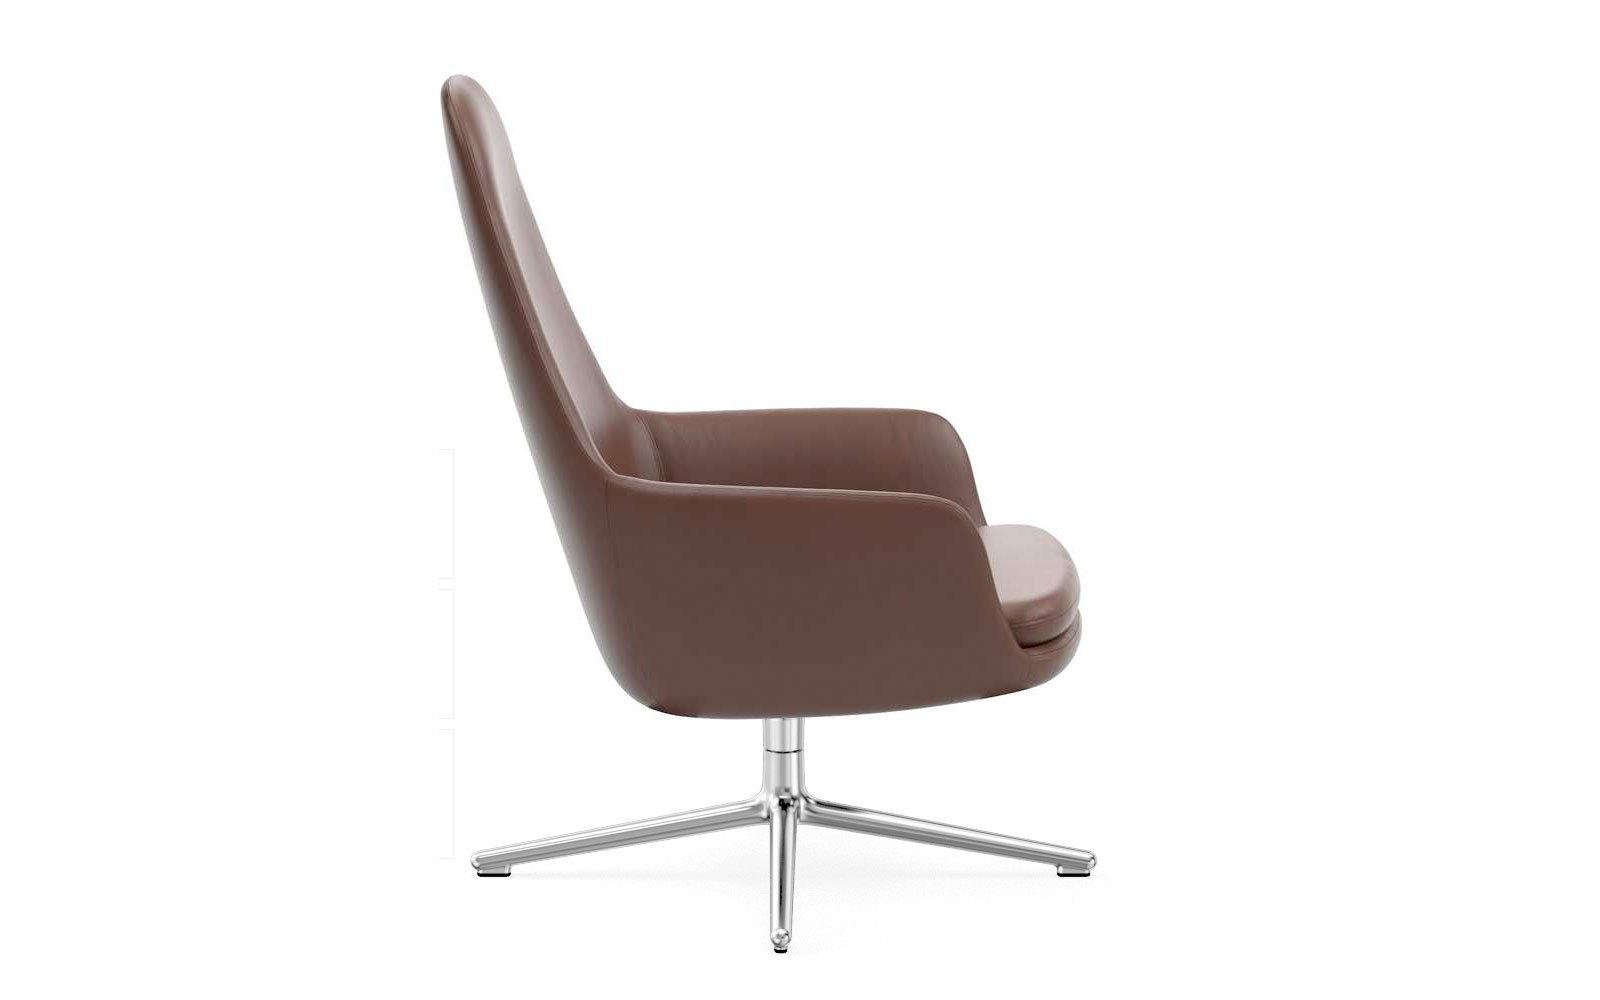 Prime Era High Back Lounge Chair With Swivel Base Ibusinesslaw Wood Chair Design Ideas Ibusinesslaworg